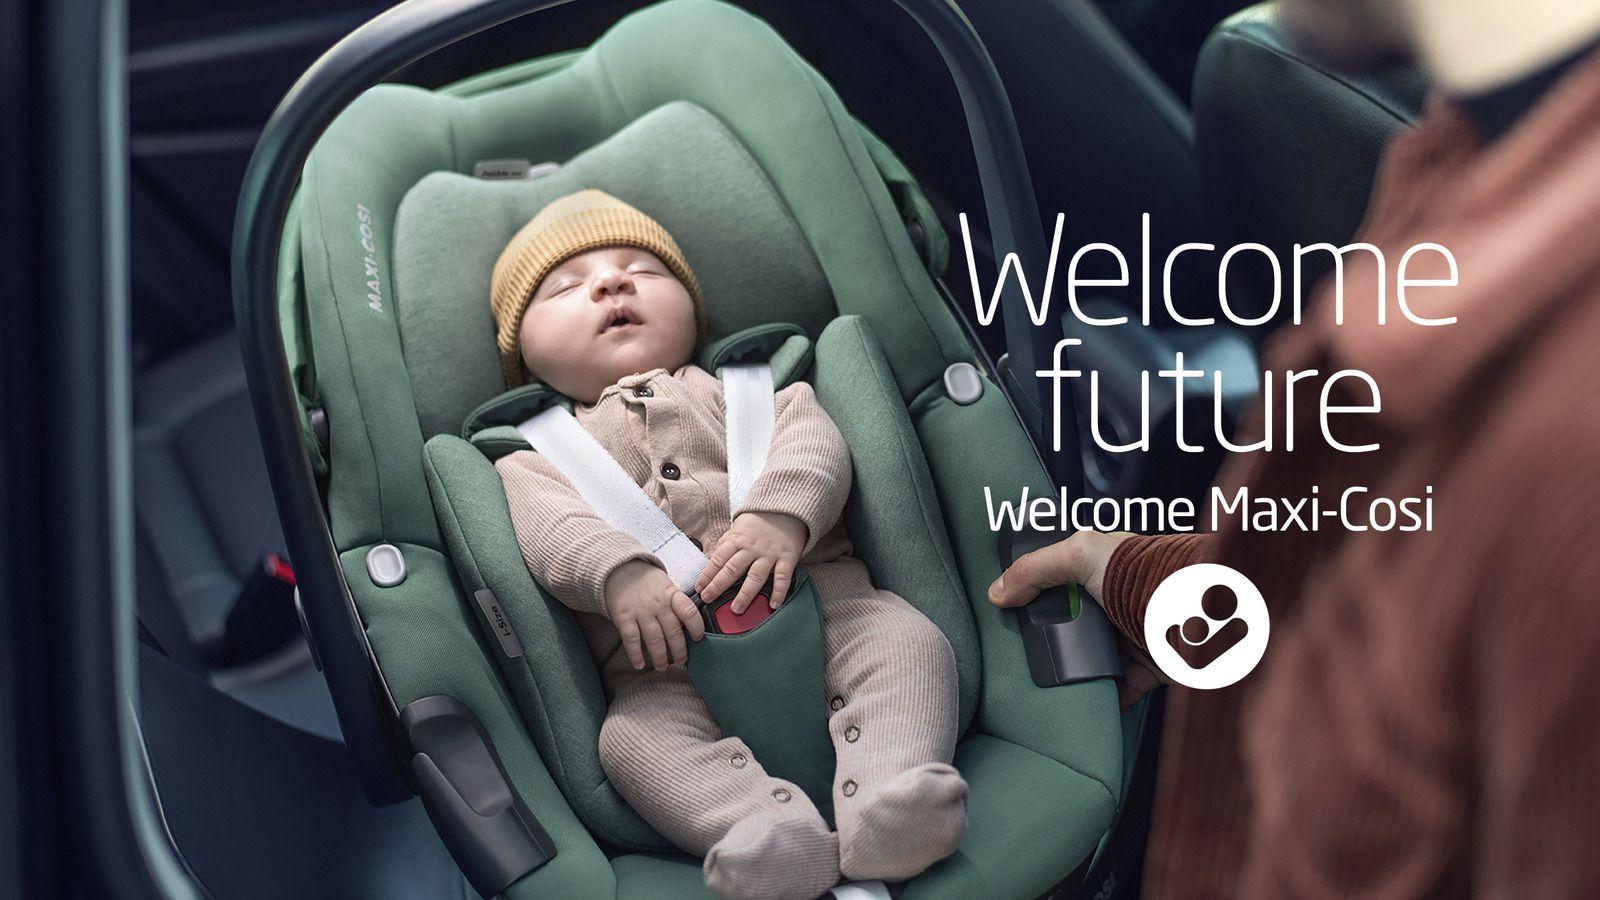 L'arrivée de Maxi-Cosi en France et l'avenir de Bébé Confort